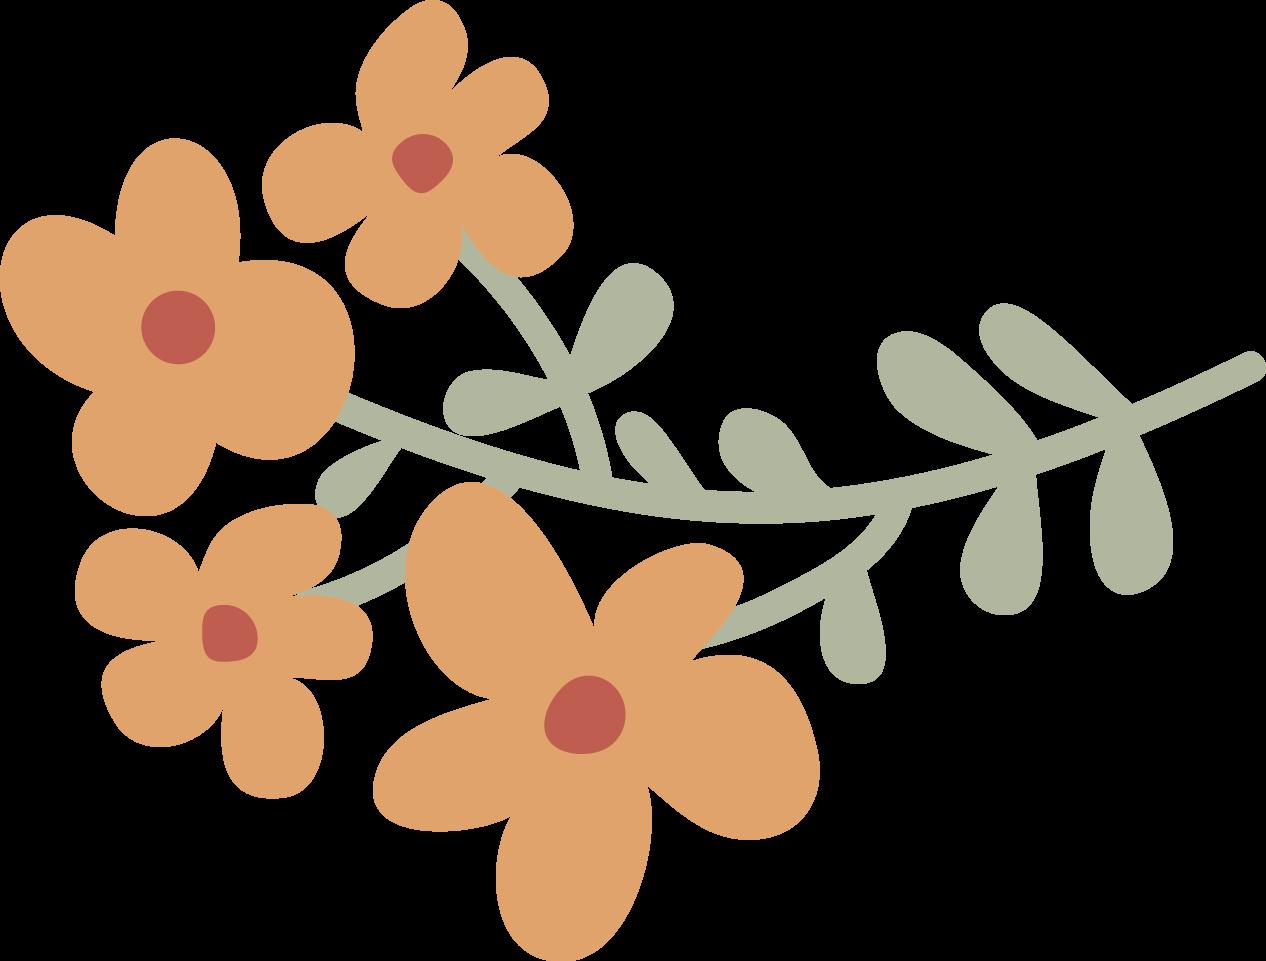 Imagenes De Flores Transparentes - Flores Tropicales 6 Clip Art 300dpi Png Imagen con por